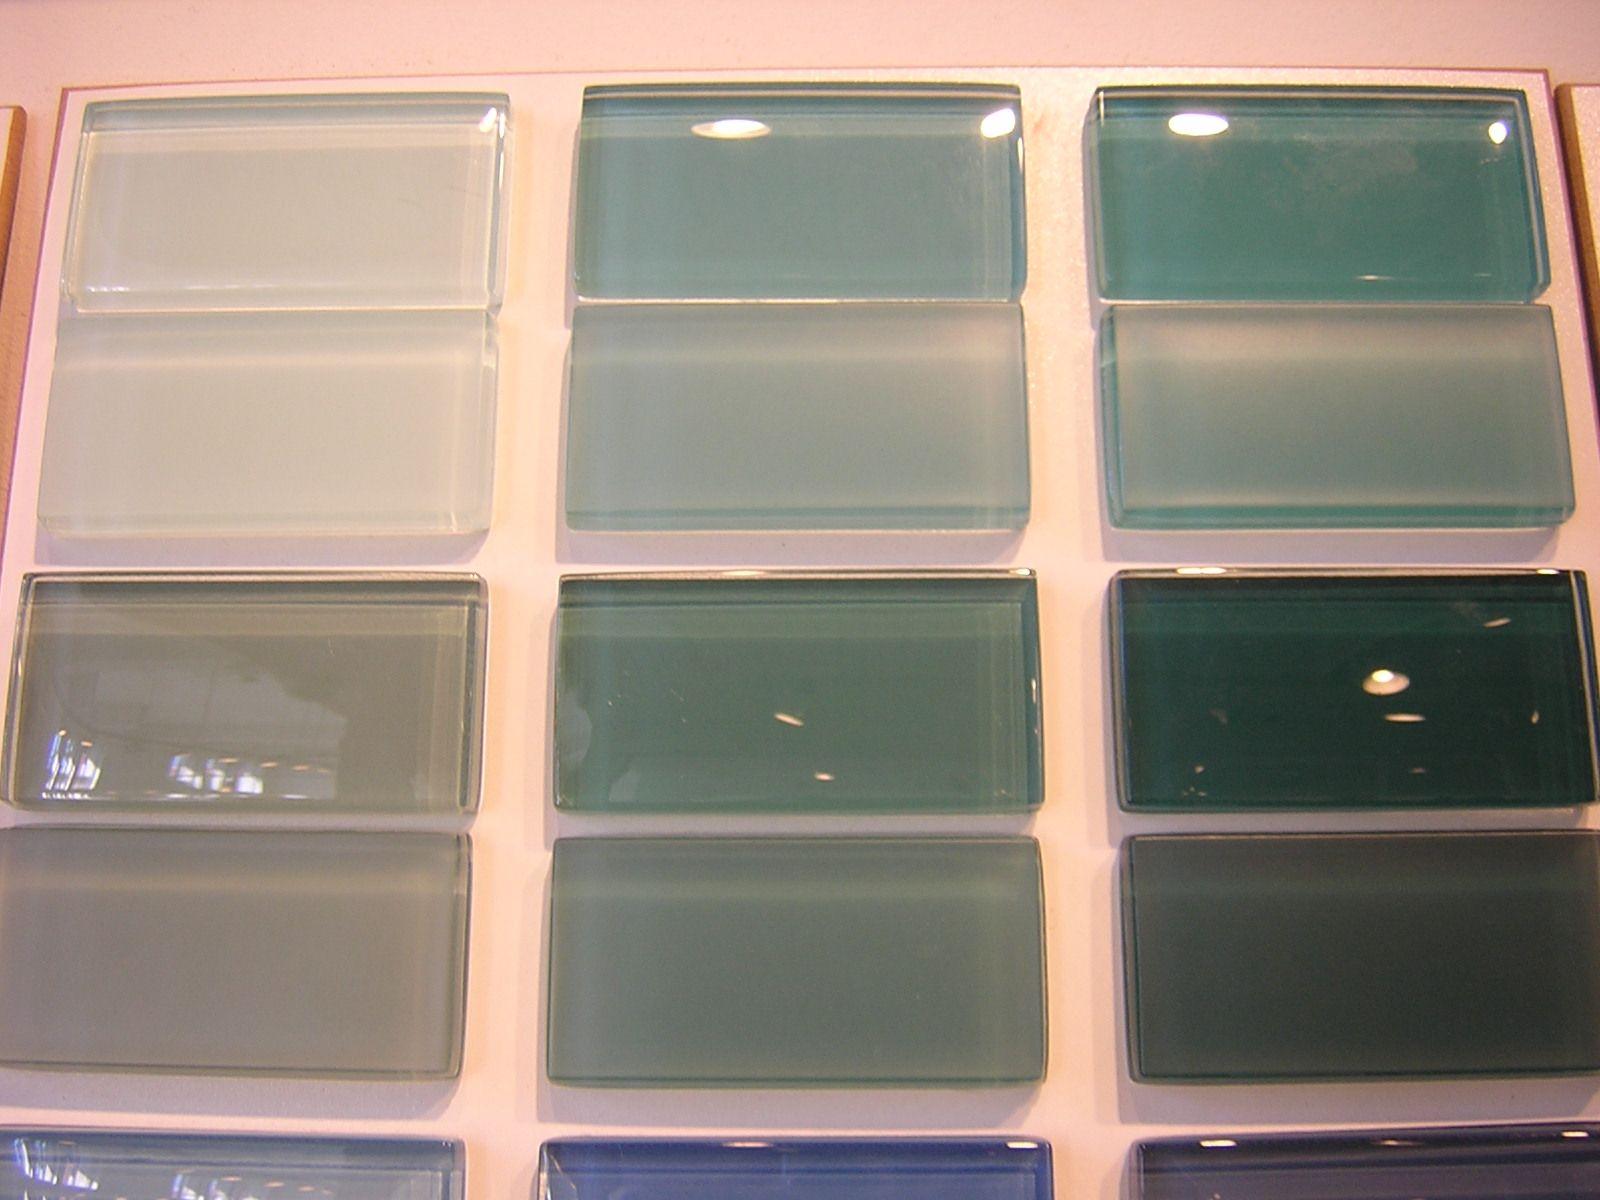 Backsplash ideas recycled glass tile backsplash home decor backsplash ideas recycled glass tile backsplash dailygadgetfo Gallery